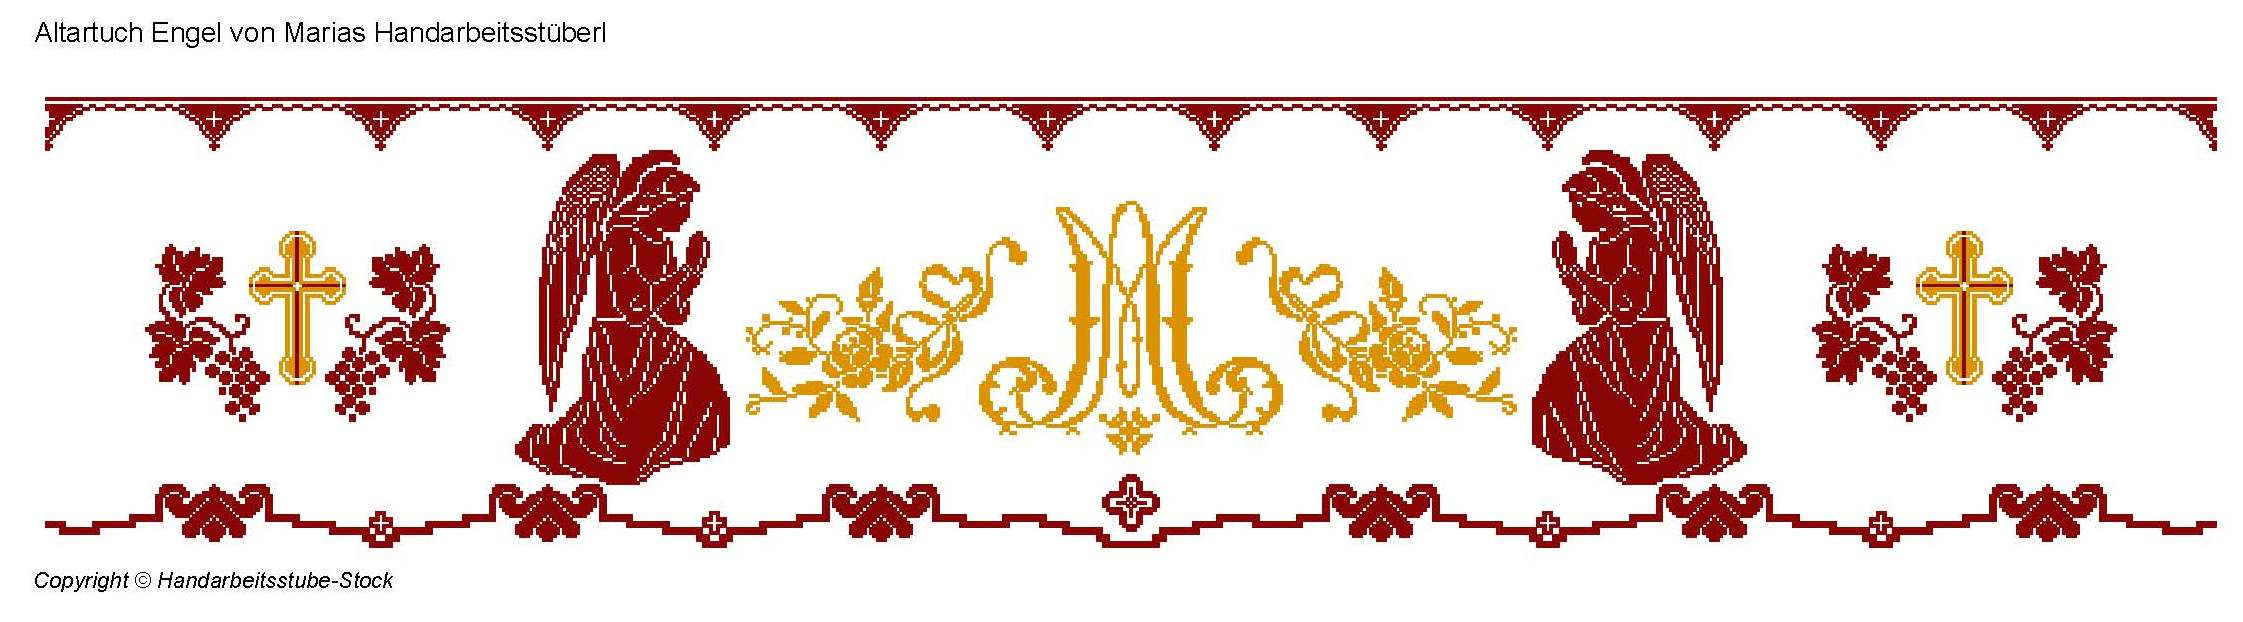 Altartuch - Engel